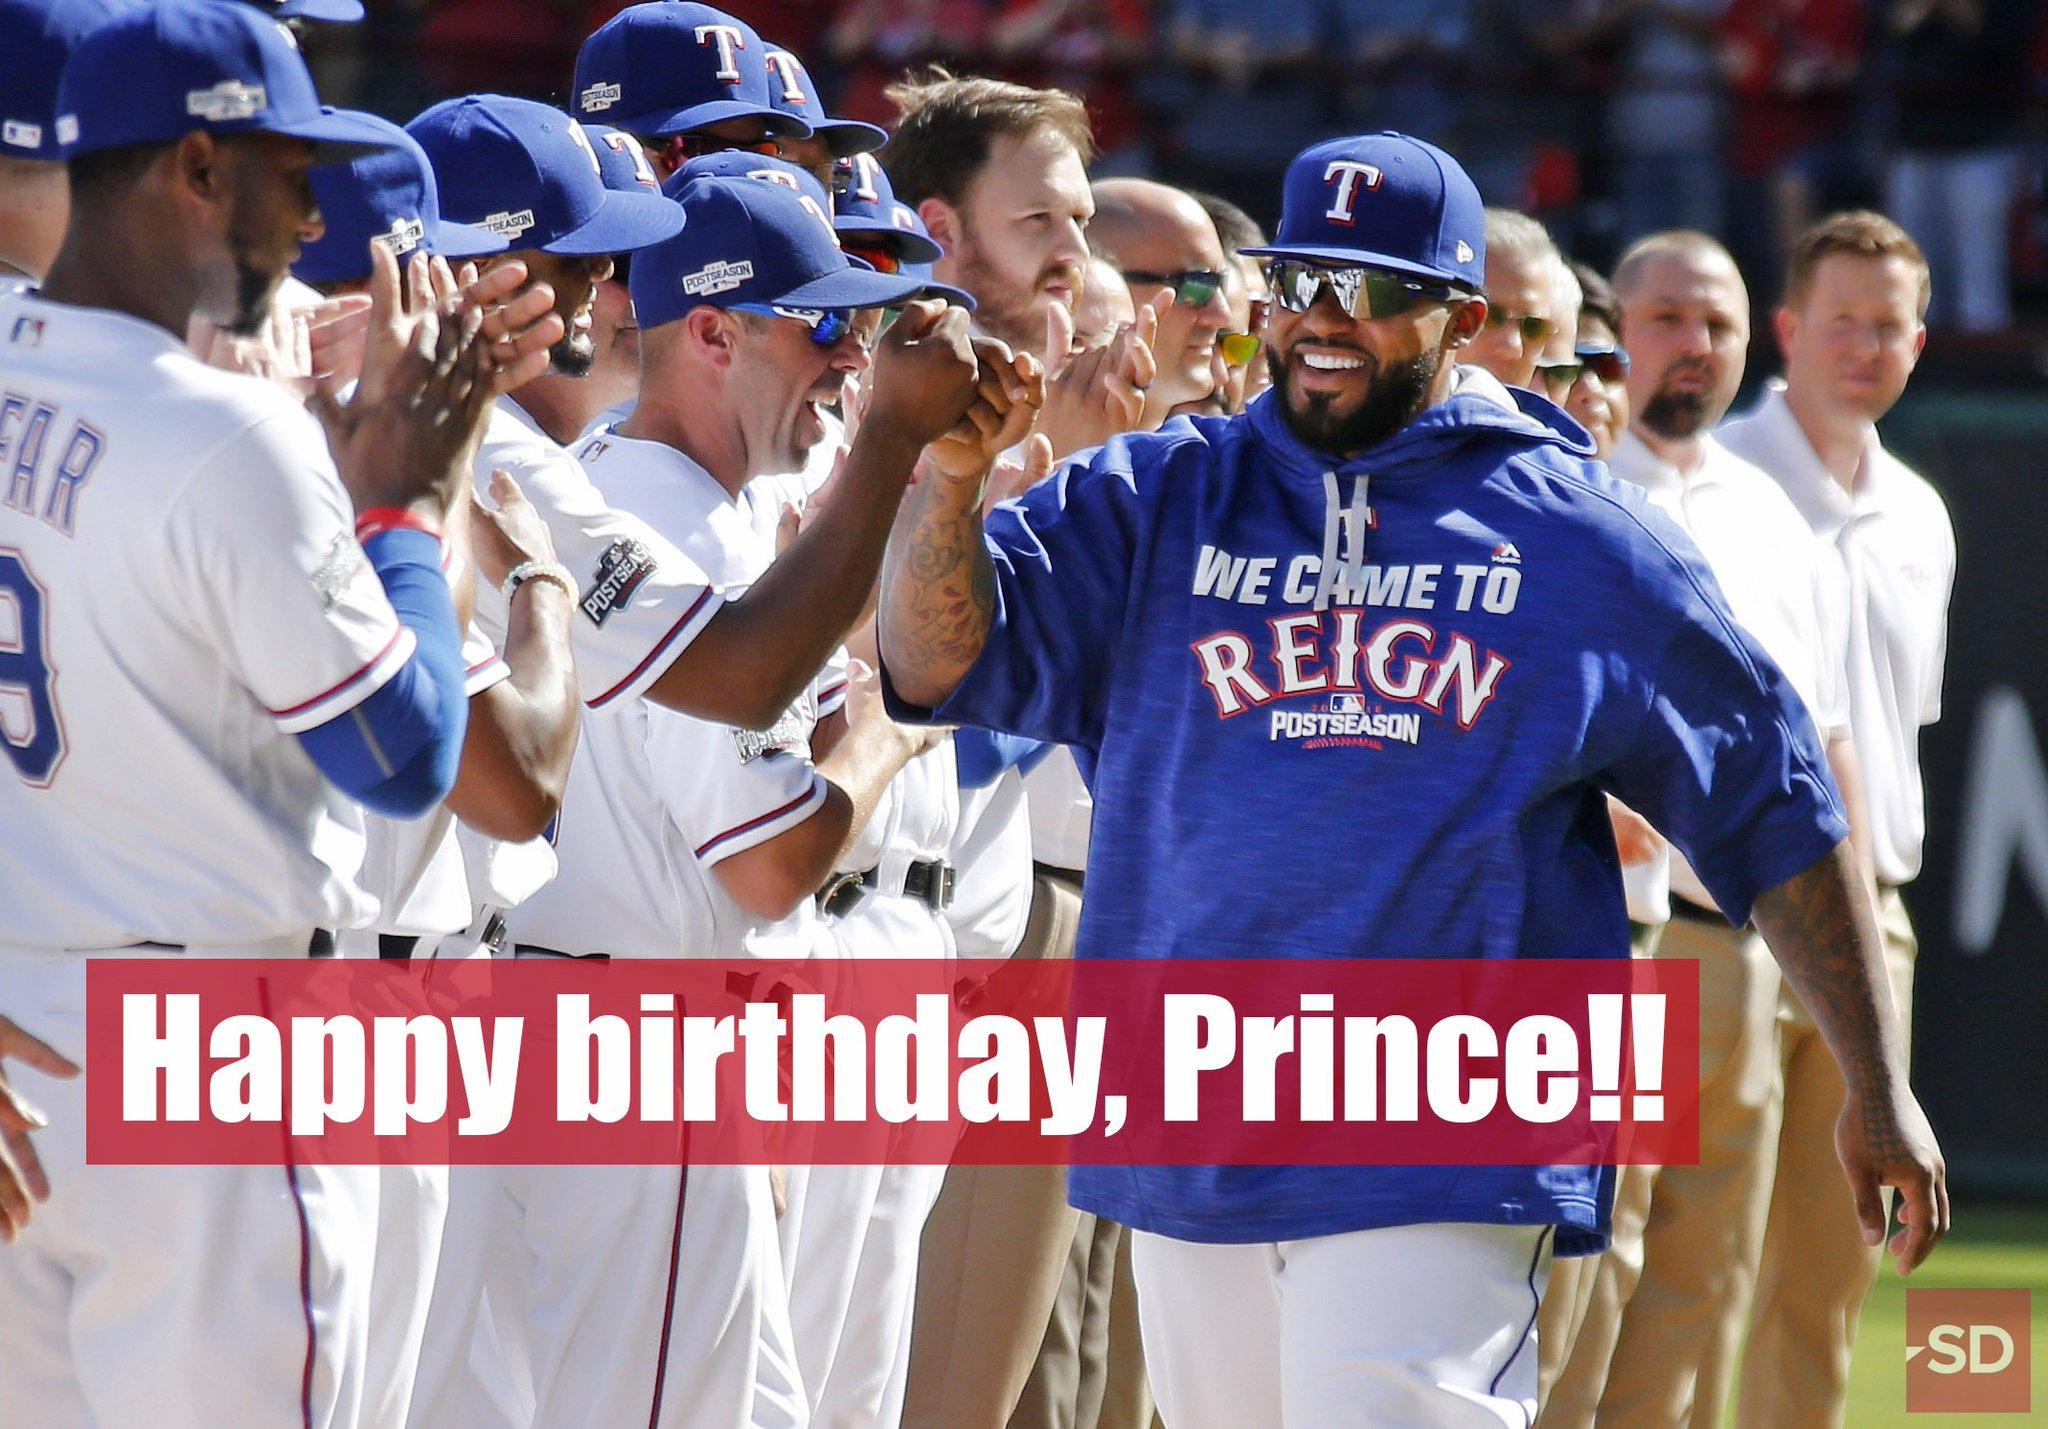 Fist bumps all around for - it\s his birthday!  Happy birthday, big man!